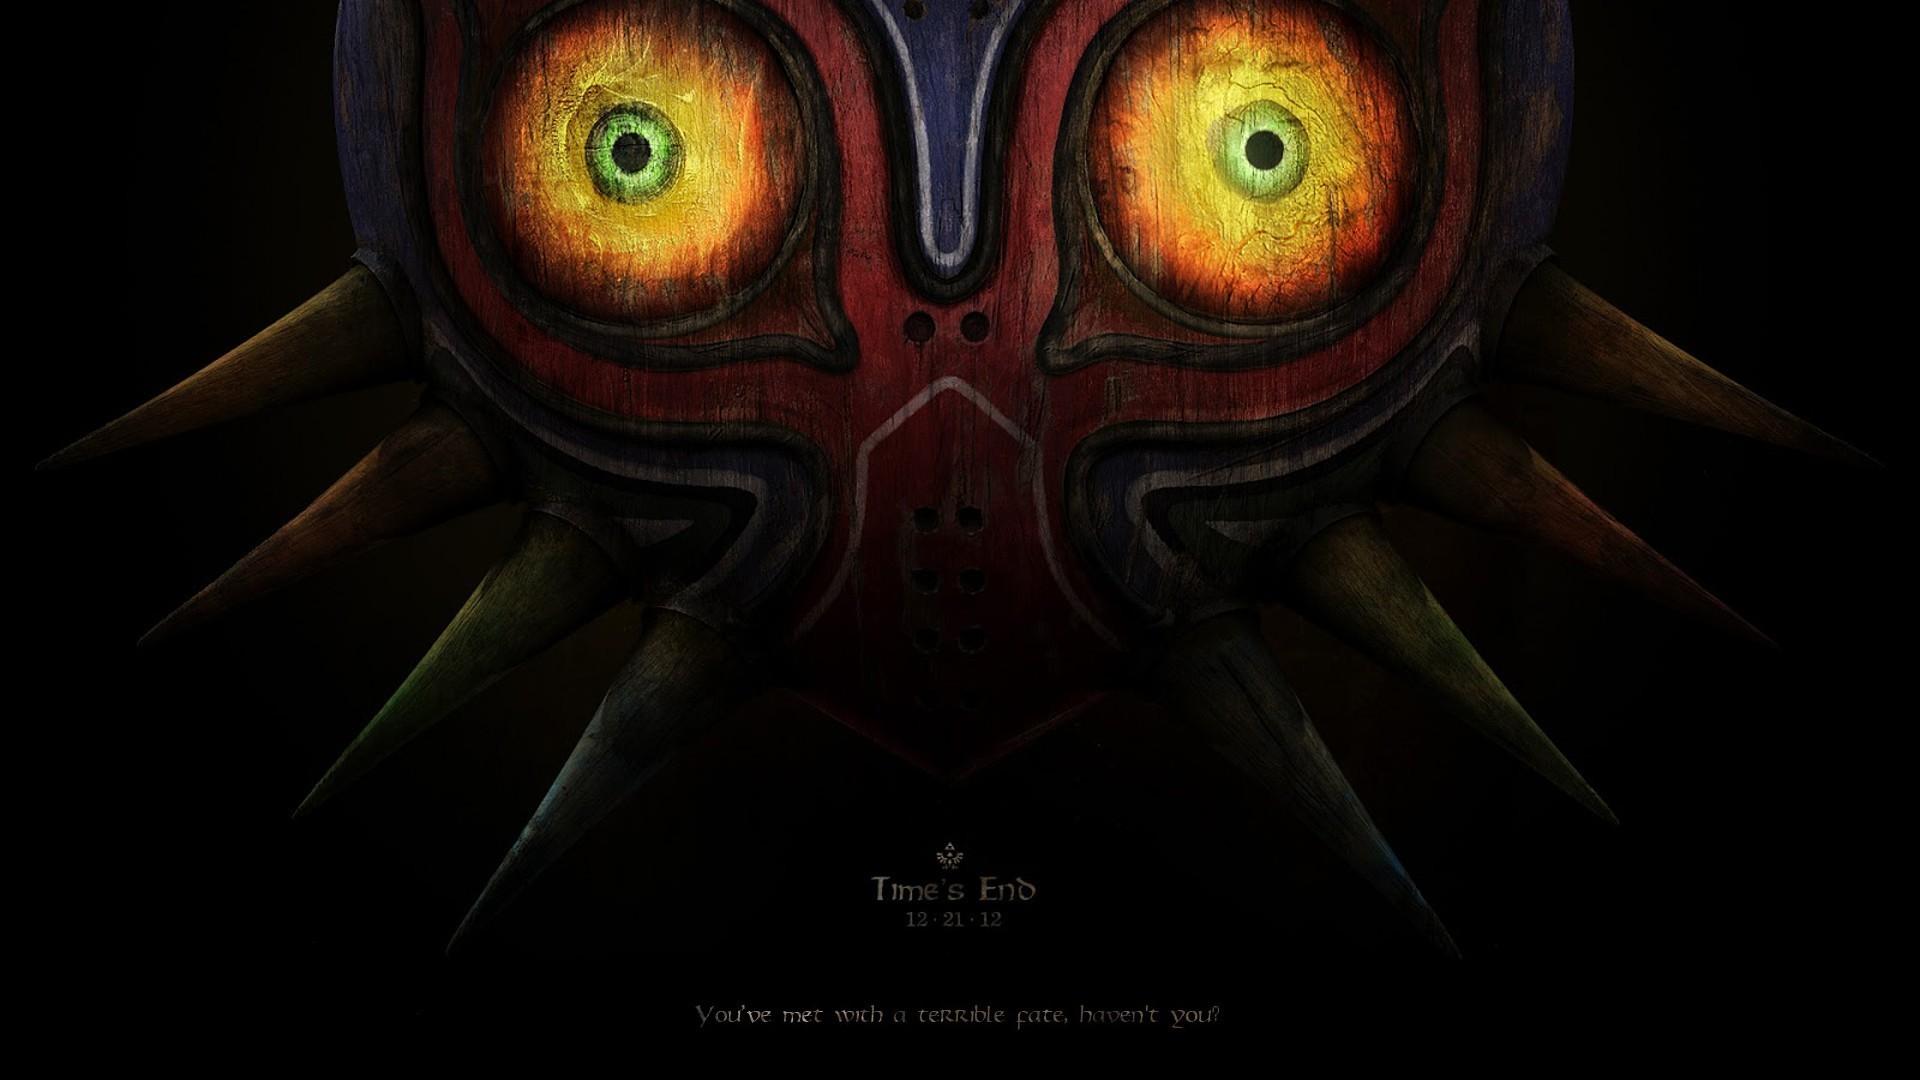 Majora's Mask – The Legend of Zelda HD Wallpaper 1920×1080